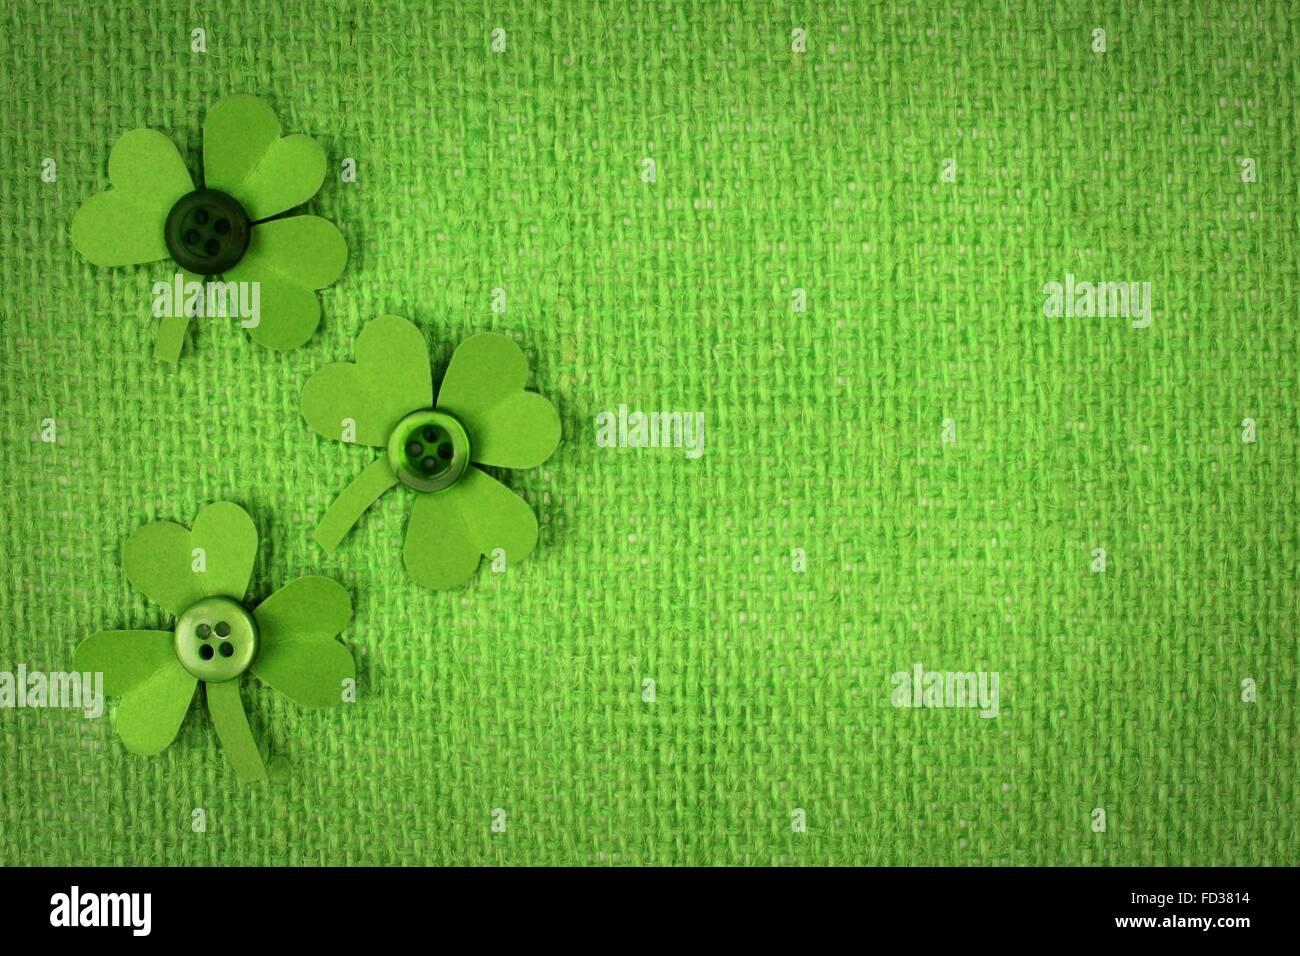 St Patricks Day green burlap with paper handmade shamrocks - Stock Image